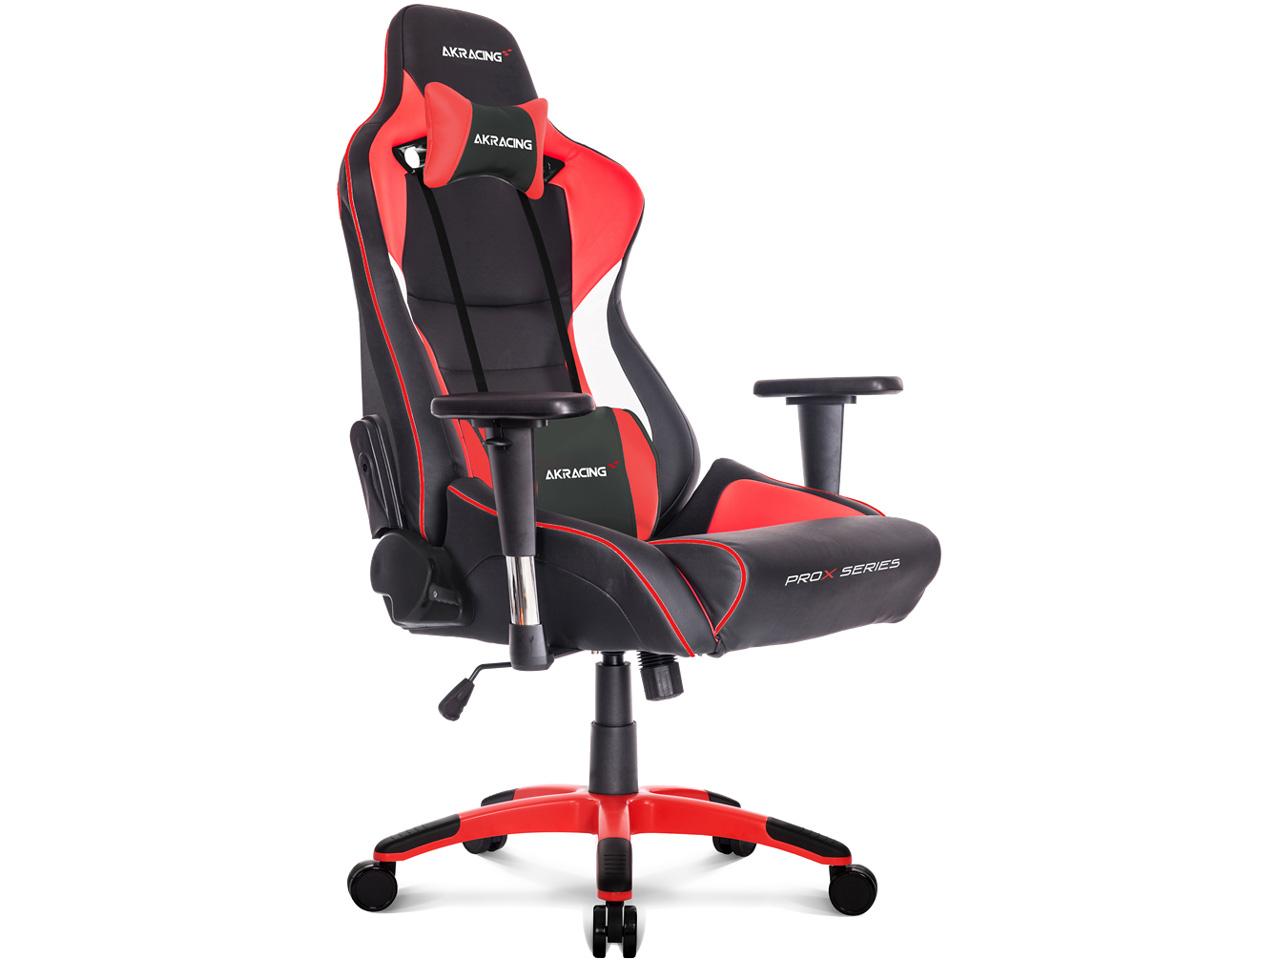 Pro-X Gaming Chair AKR-PRO-X/RED [レッド] の製品画像